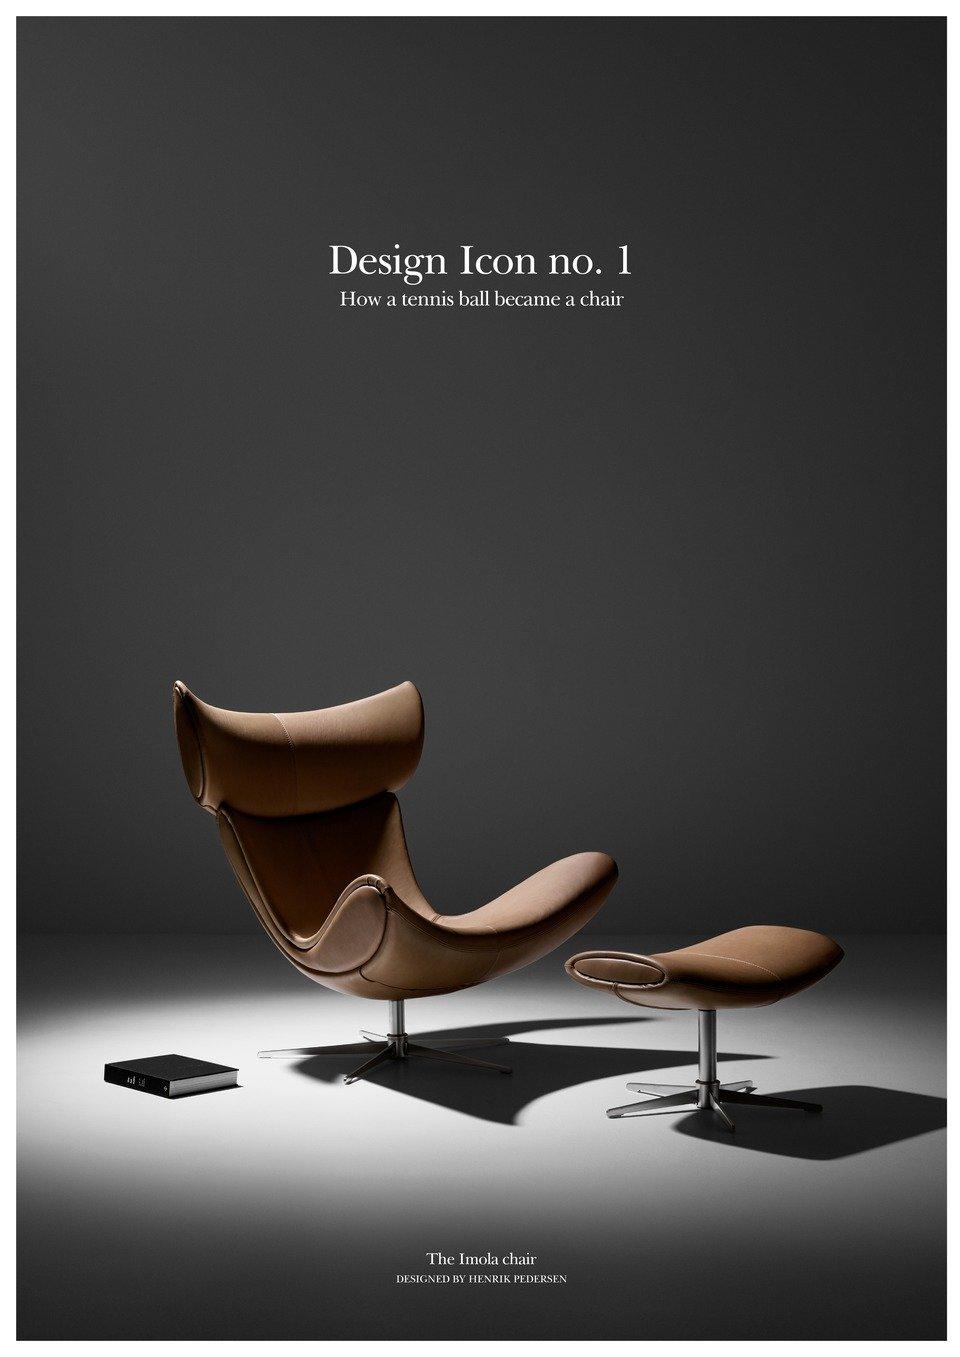 24741_Imola chair with swivel function_10002_16.jpg